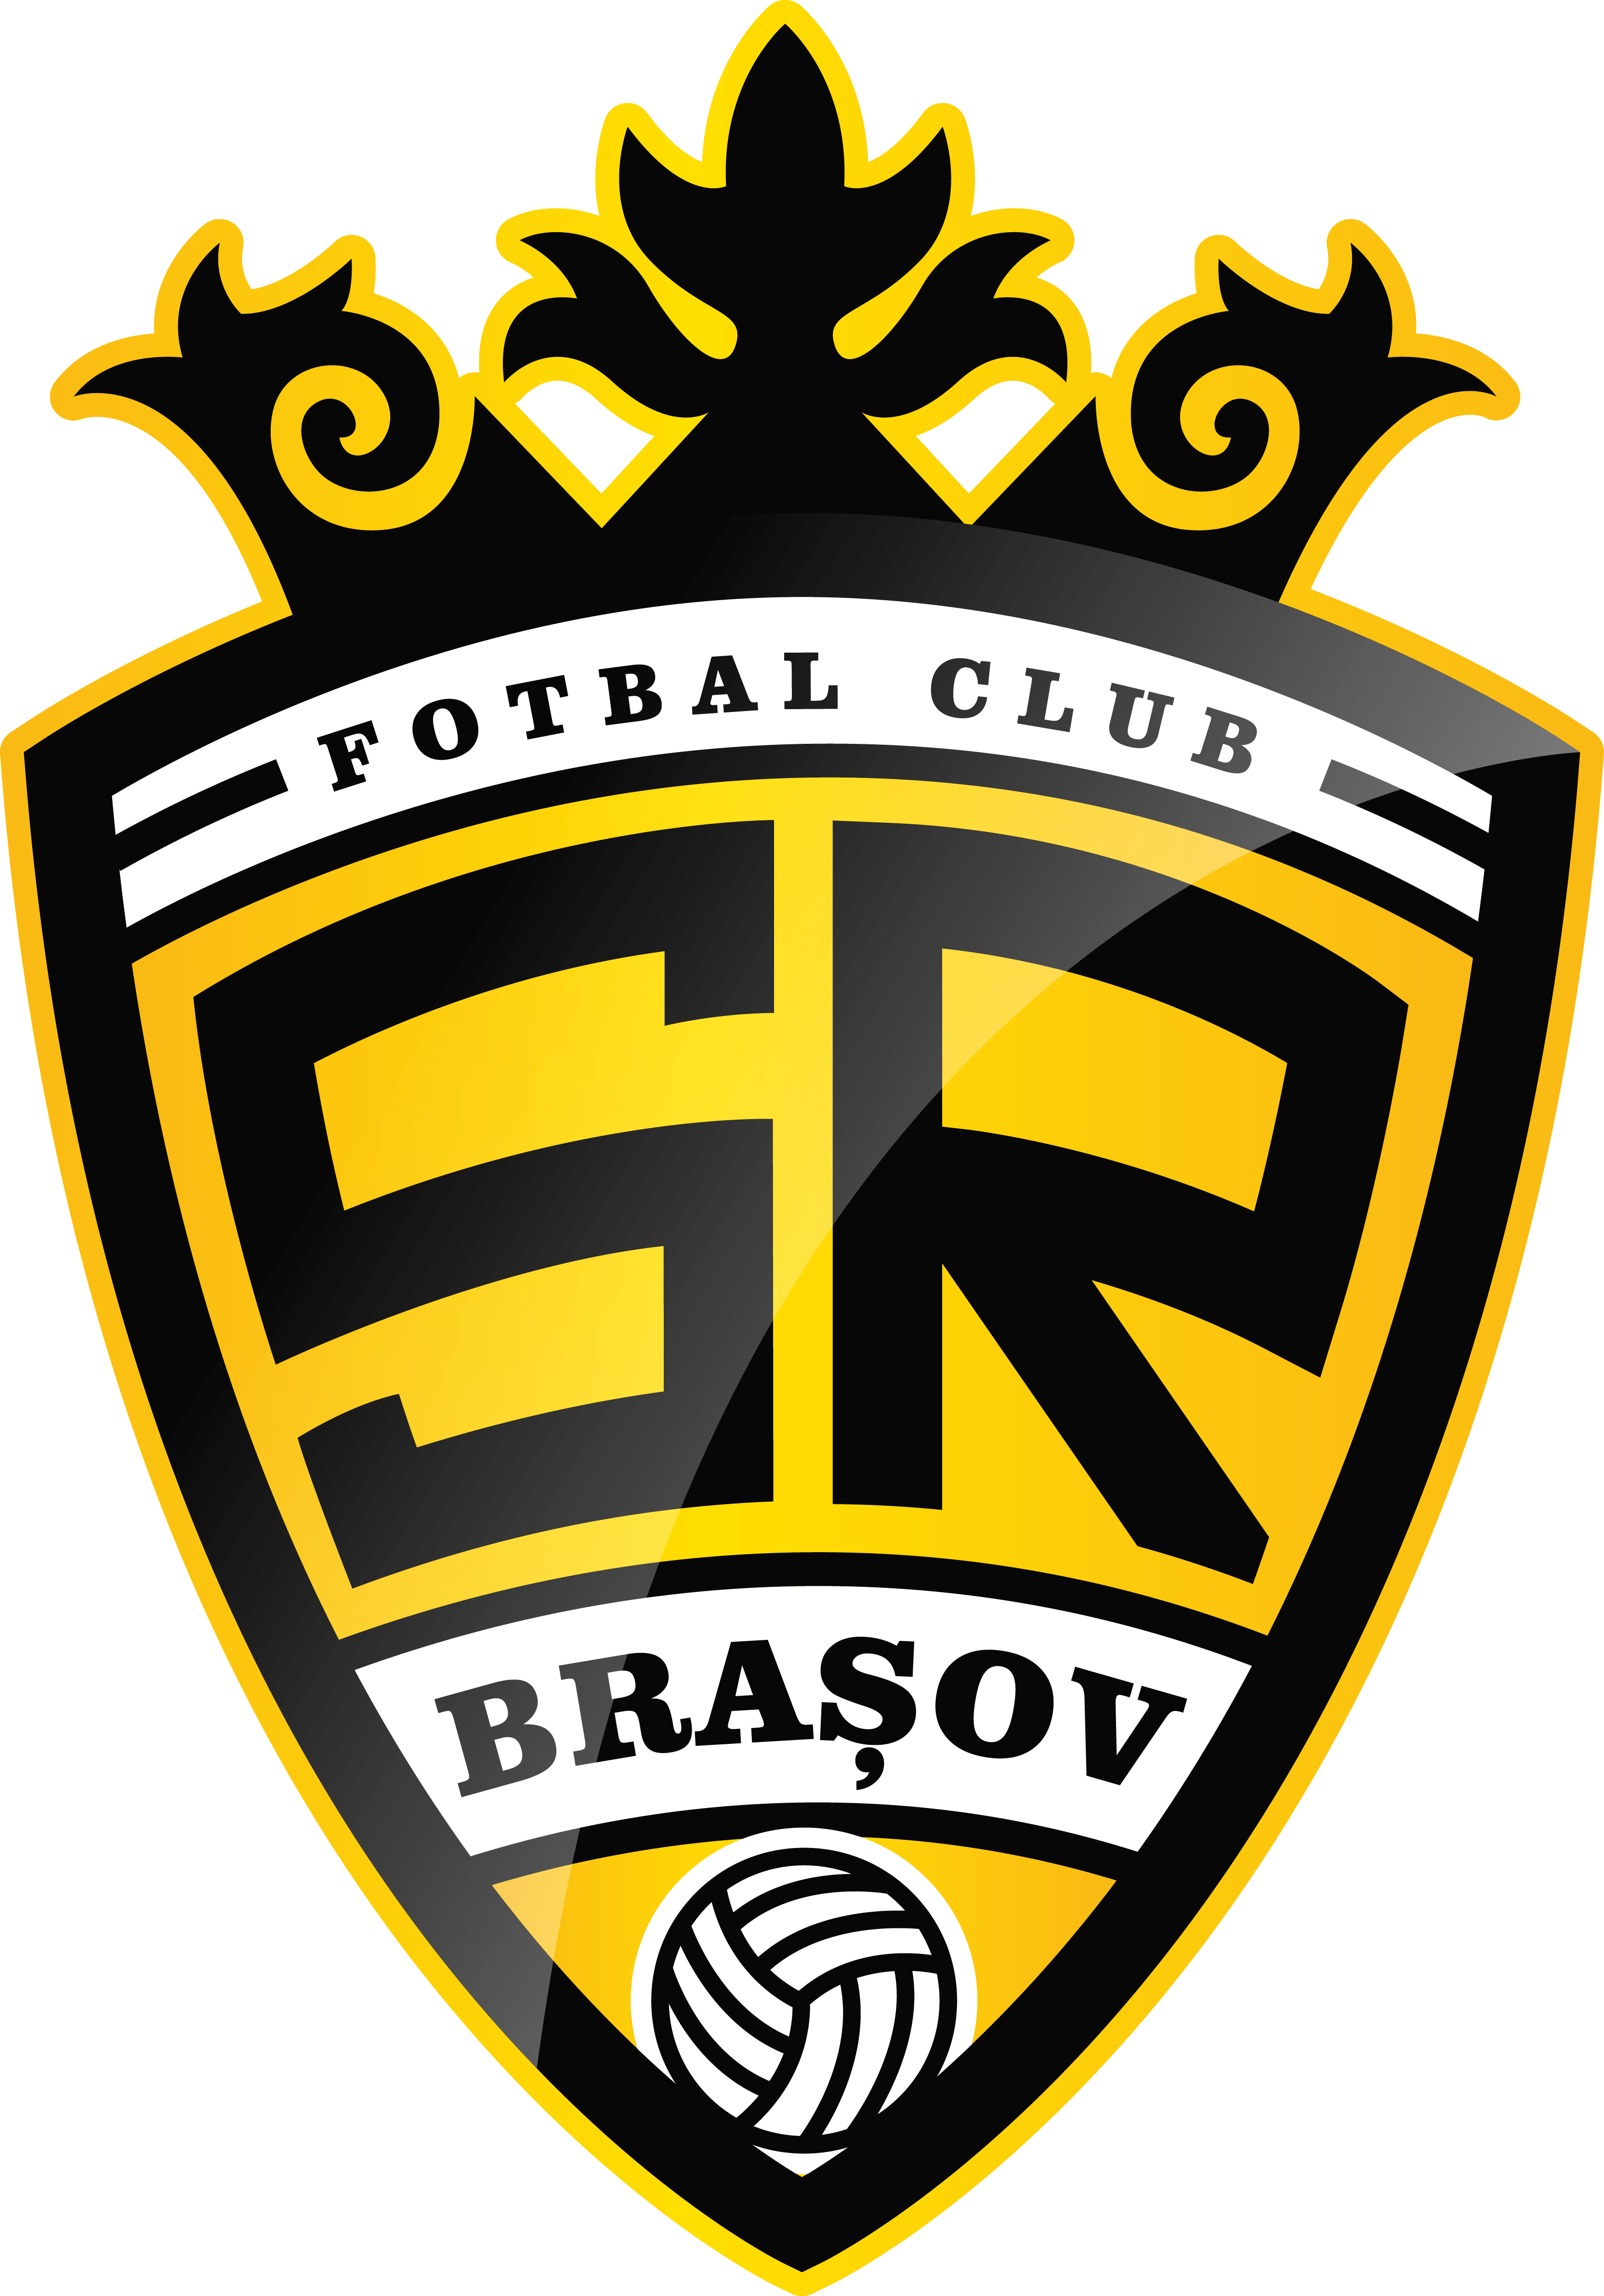 SR Brasov